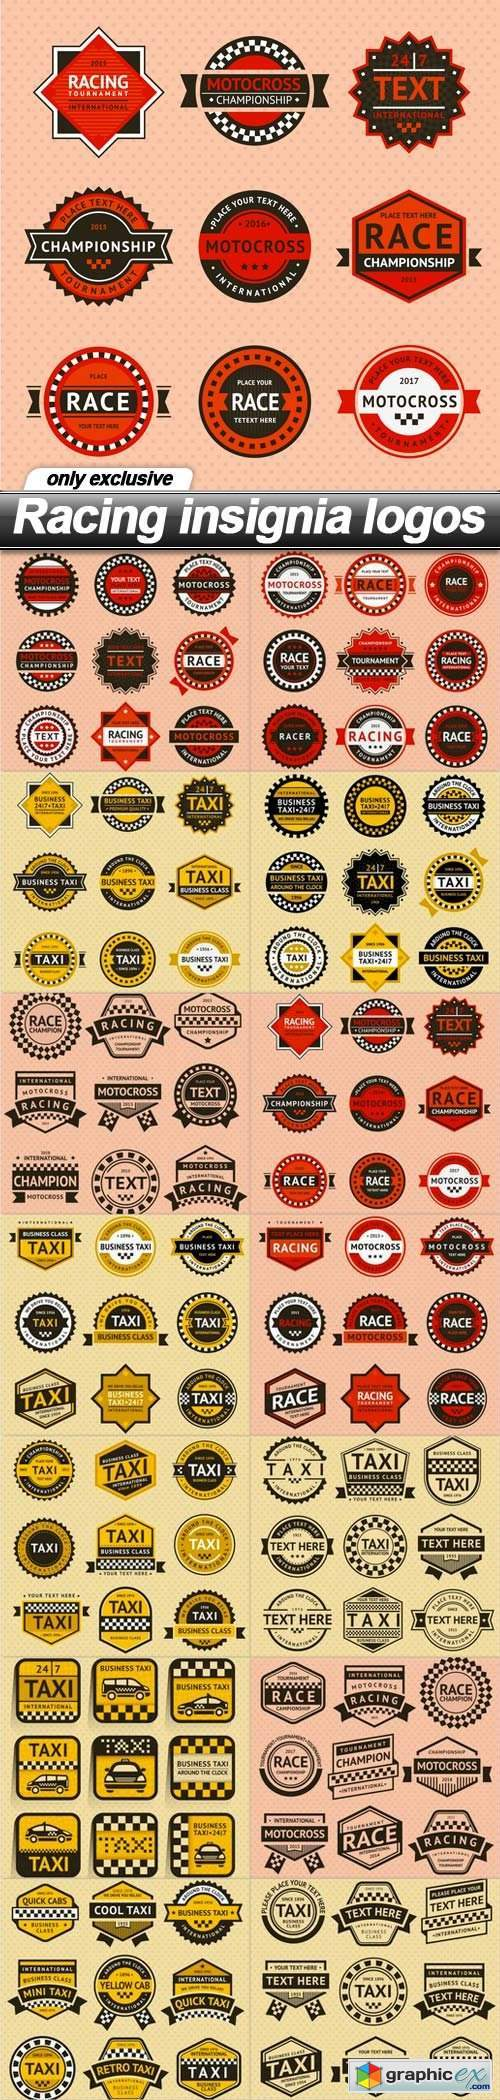 Racing insignia logos - 14 EPS